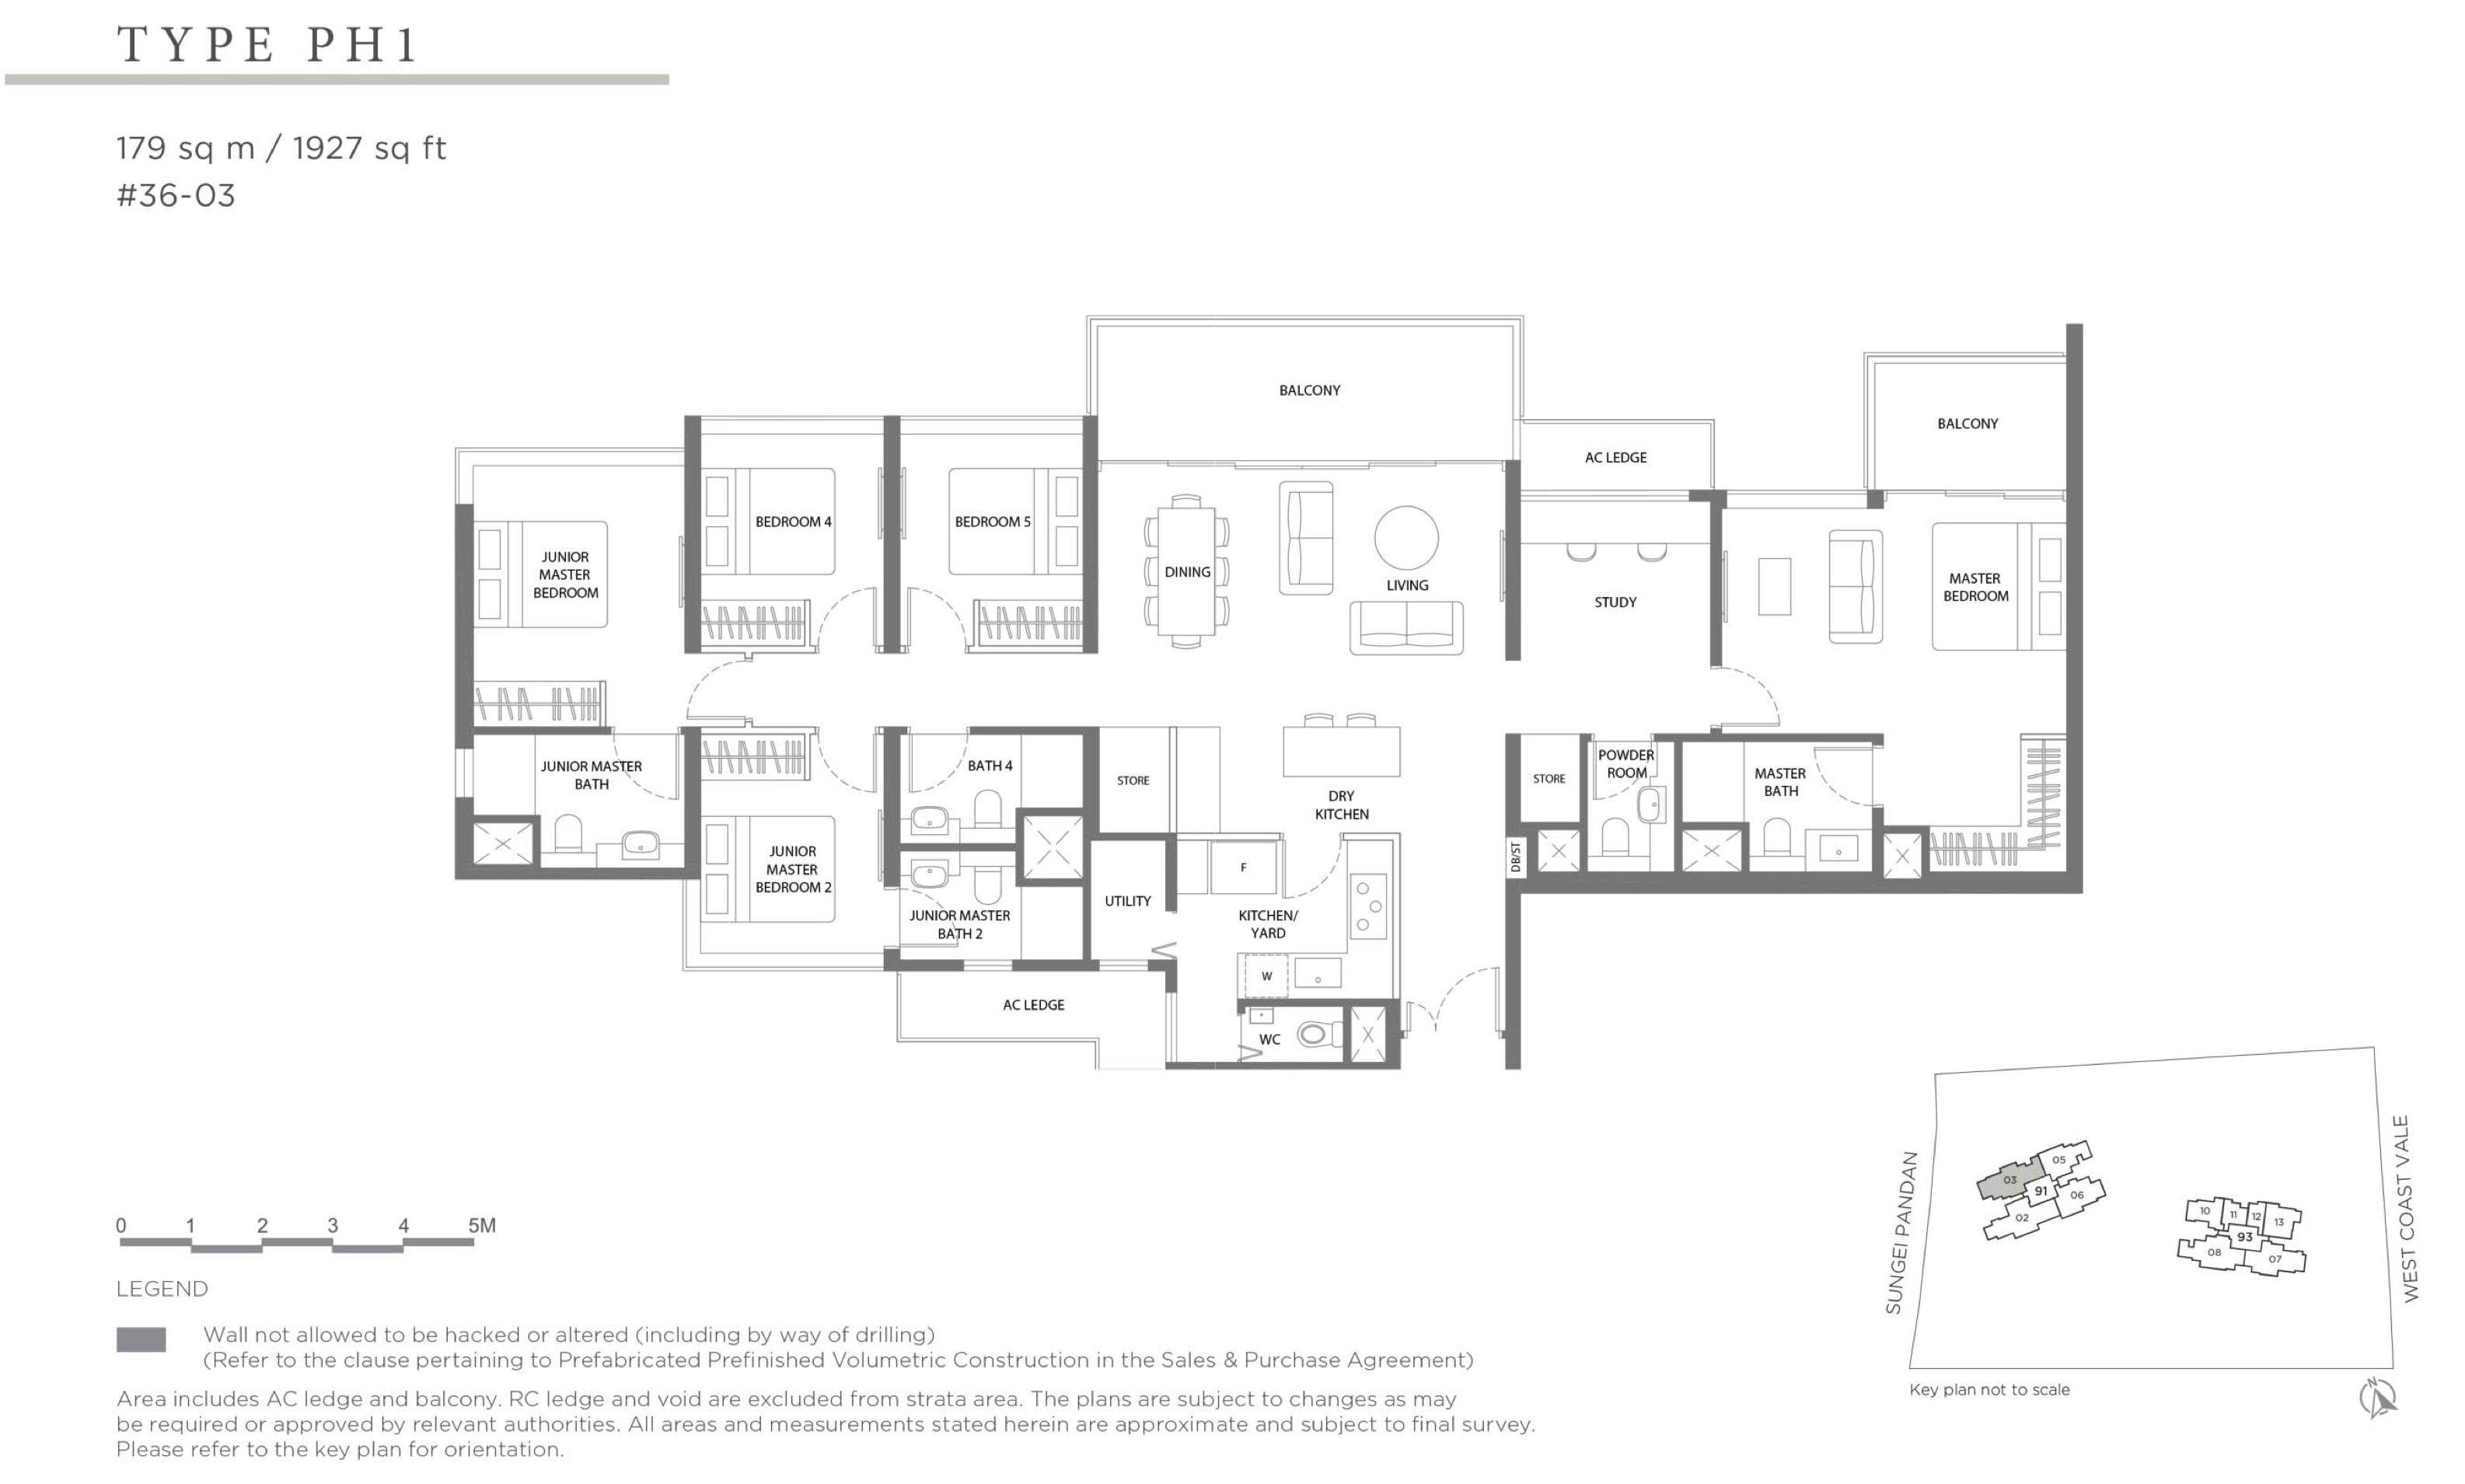 Twin VEW 5 bedroom study penthouse PH1 floor plan